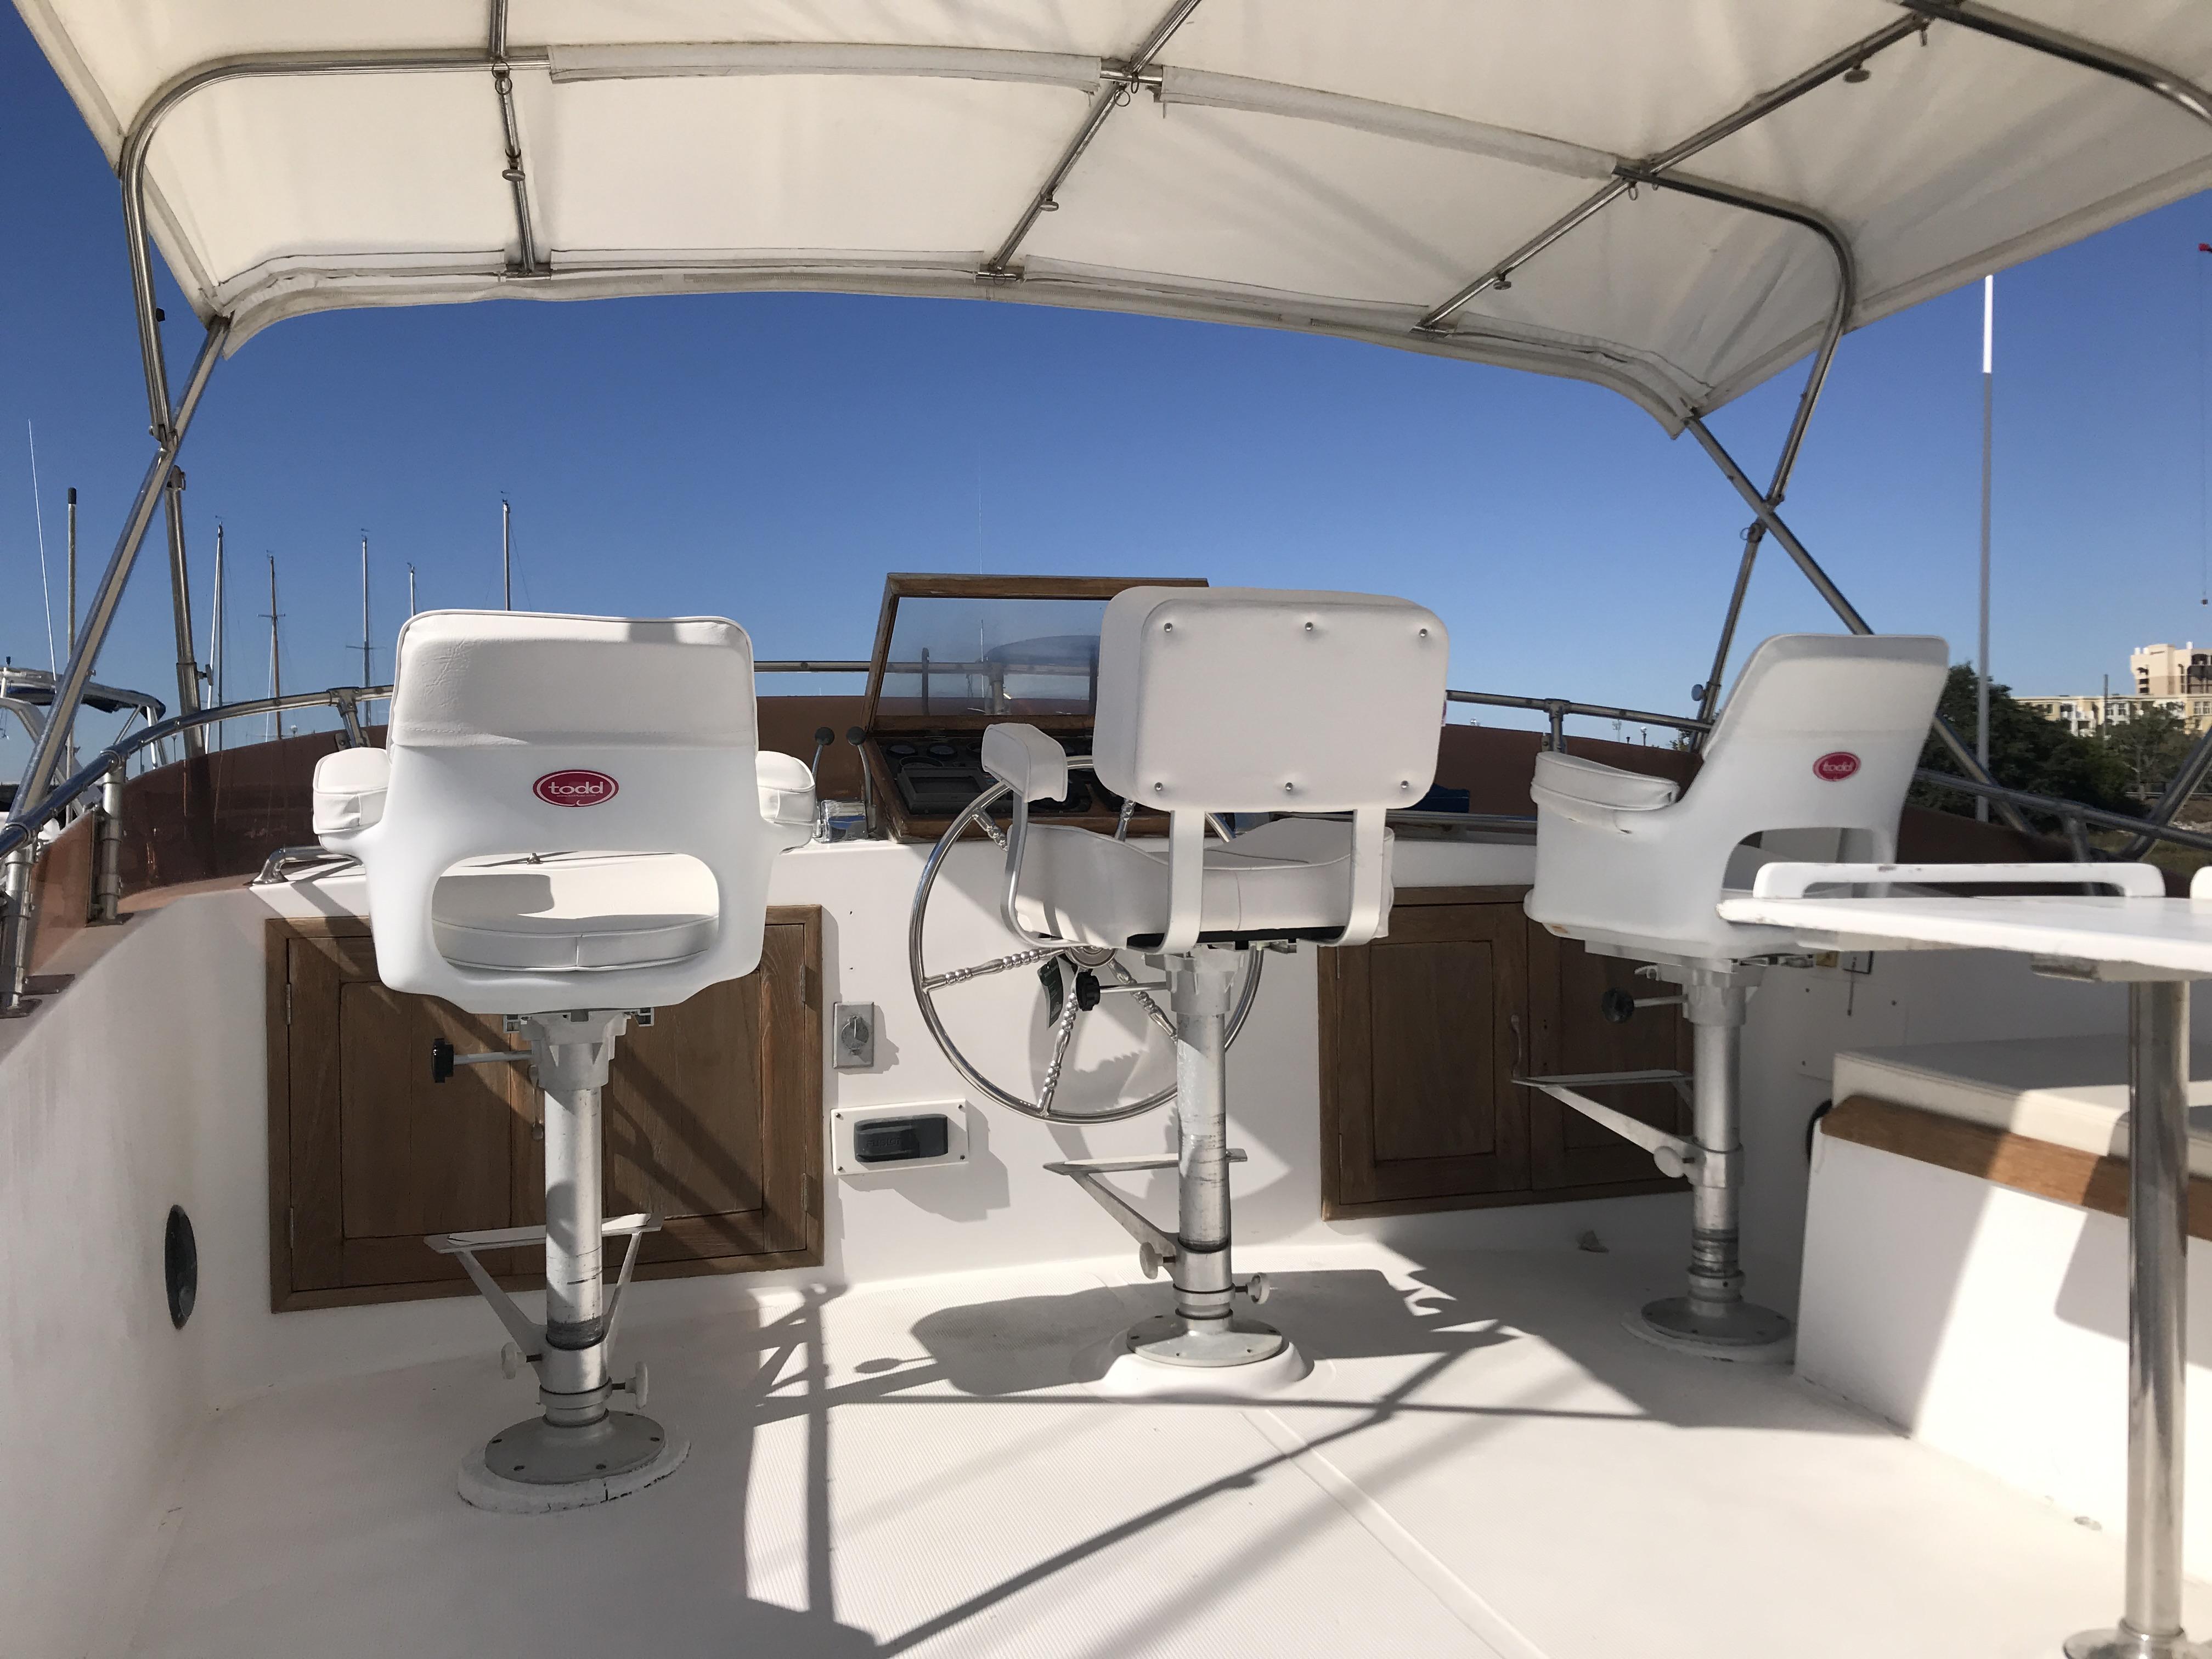 Sea Ranger SUNDECK - New flybridge helm chairs and bimini